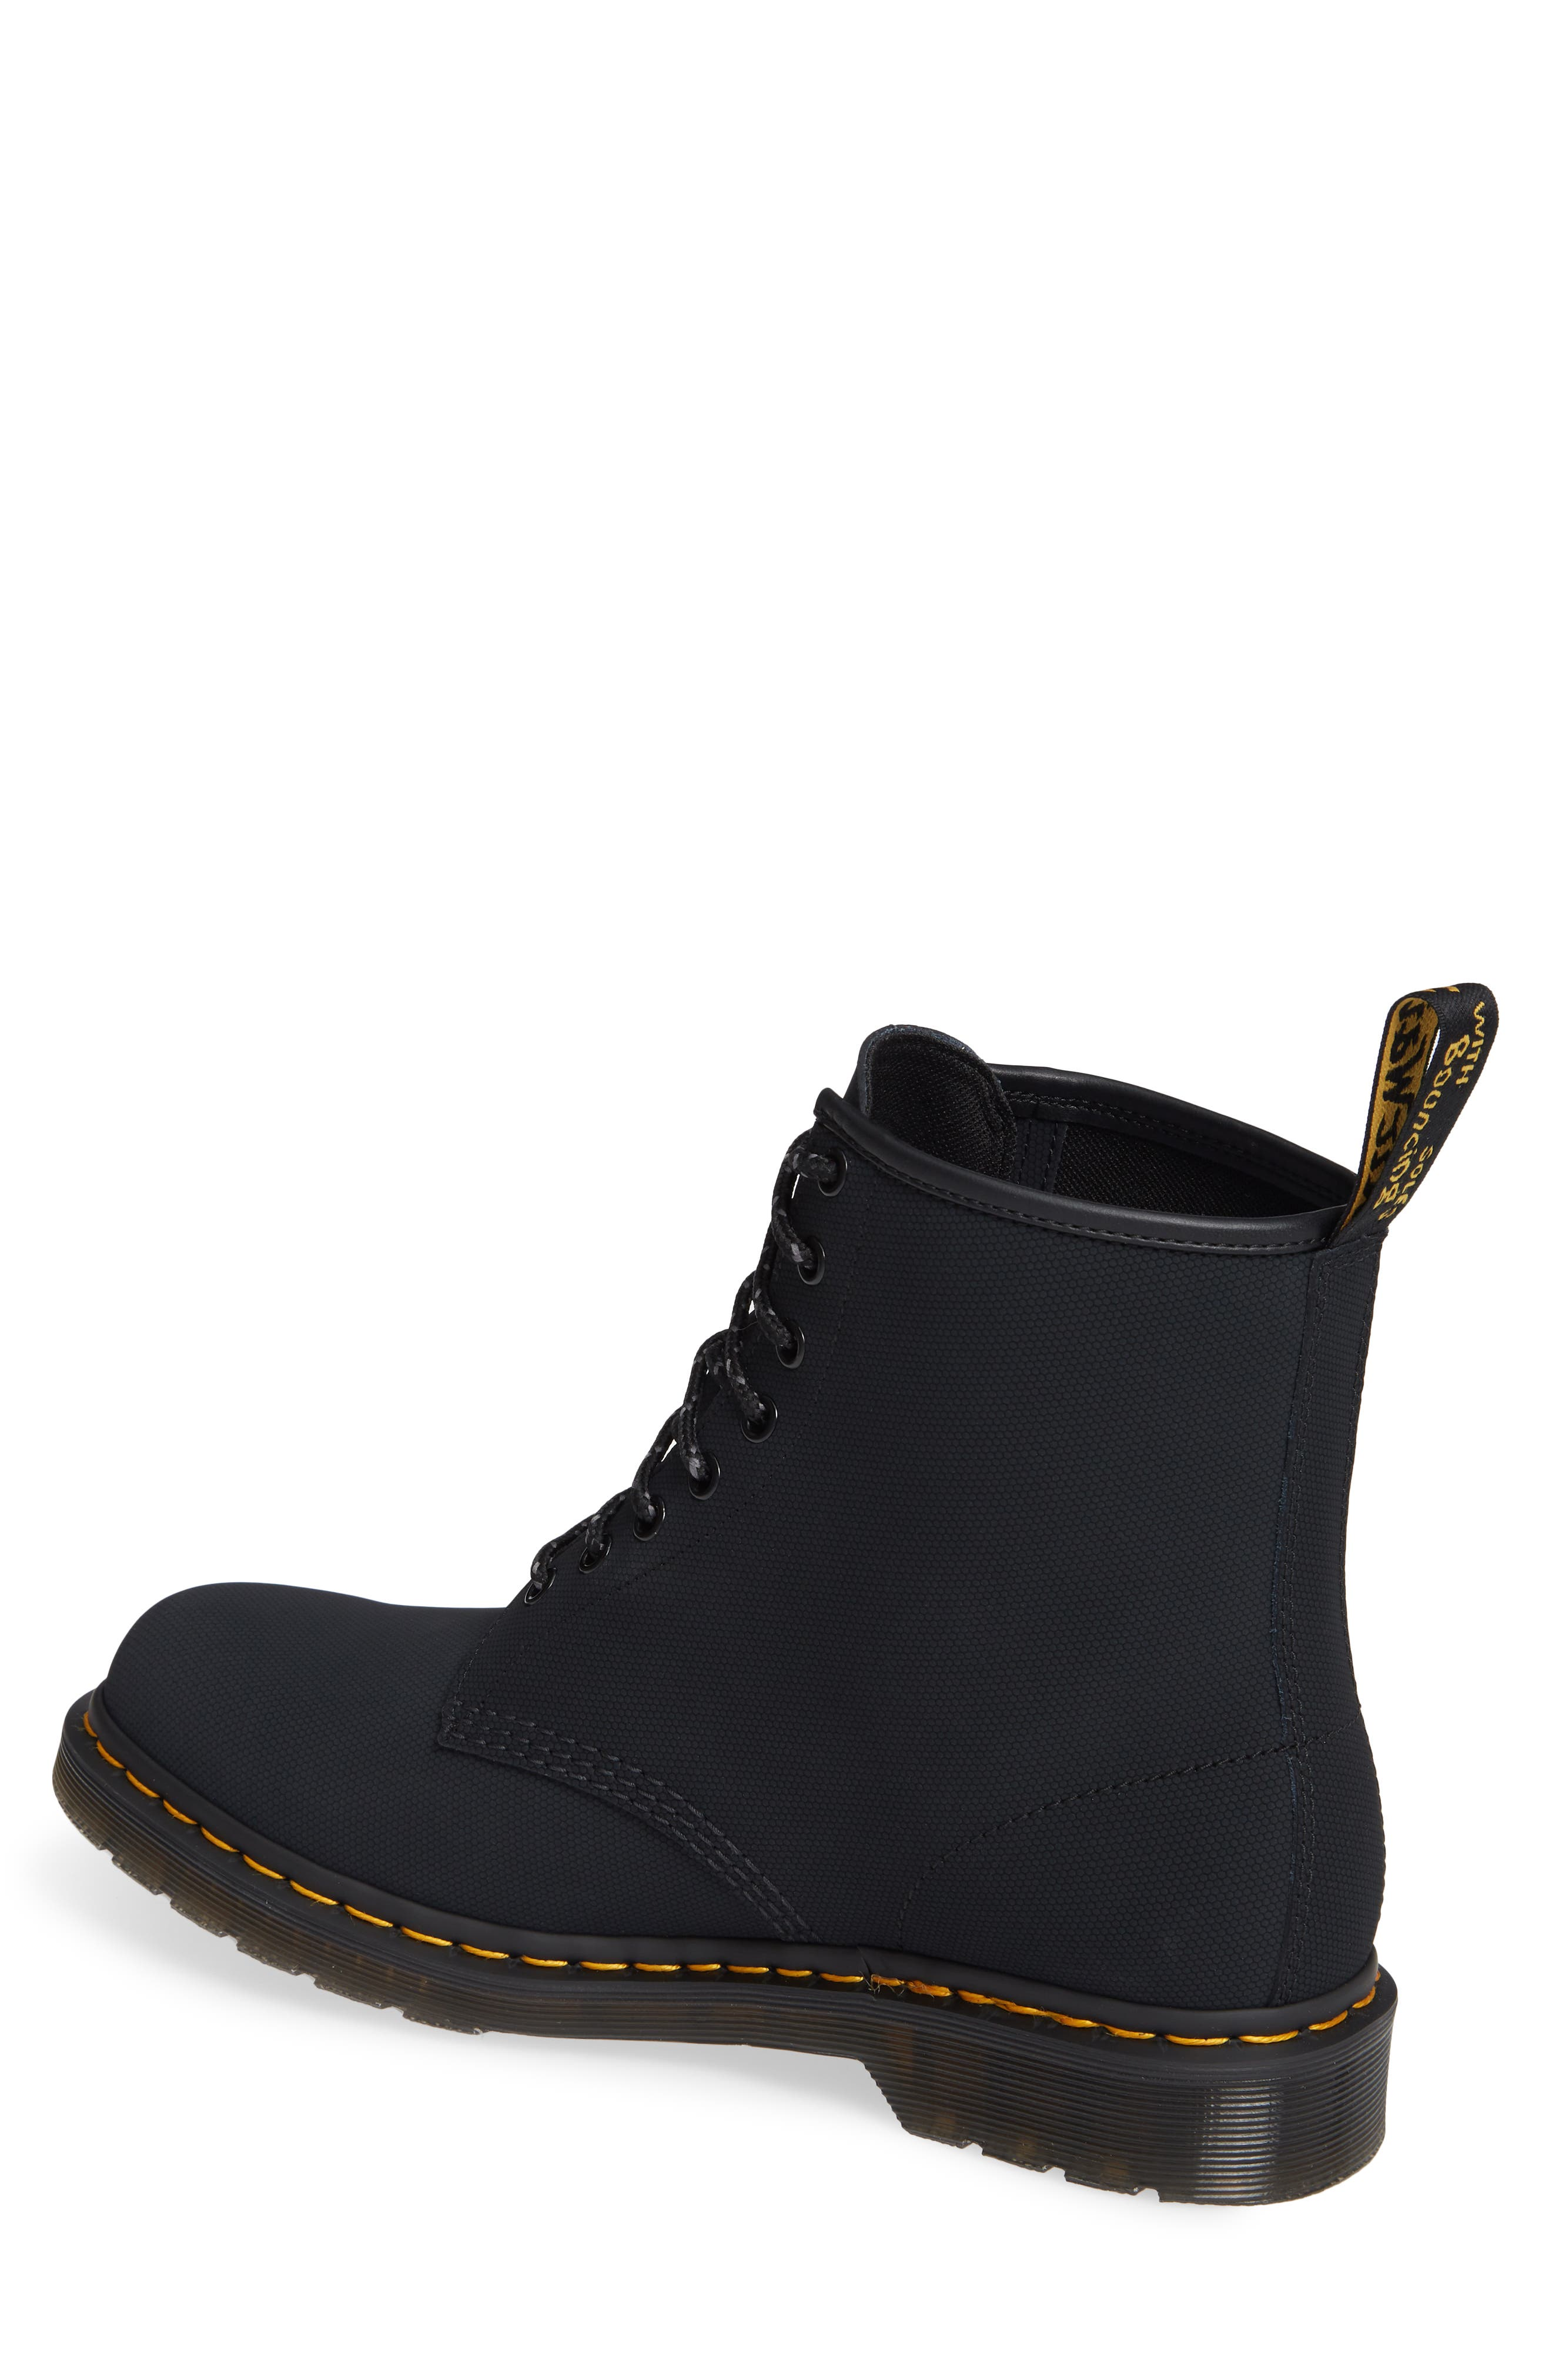 1460 - Broder Boot,                             Alternate thumbnail 2, color,                             001